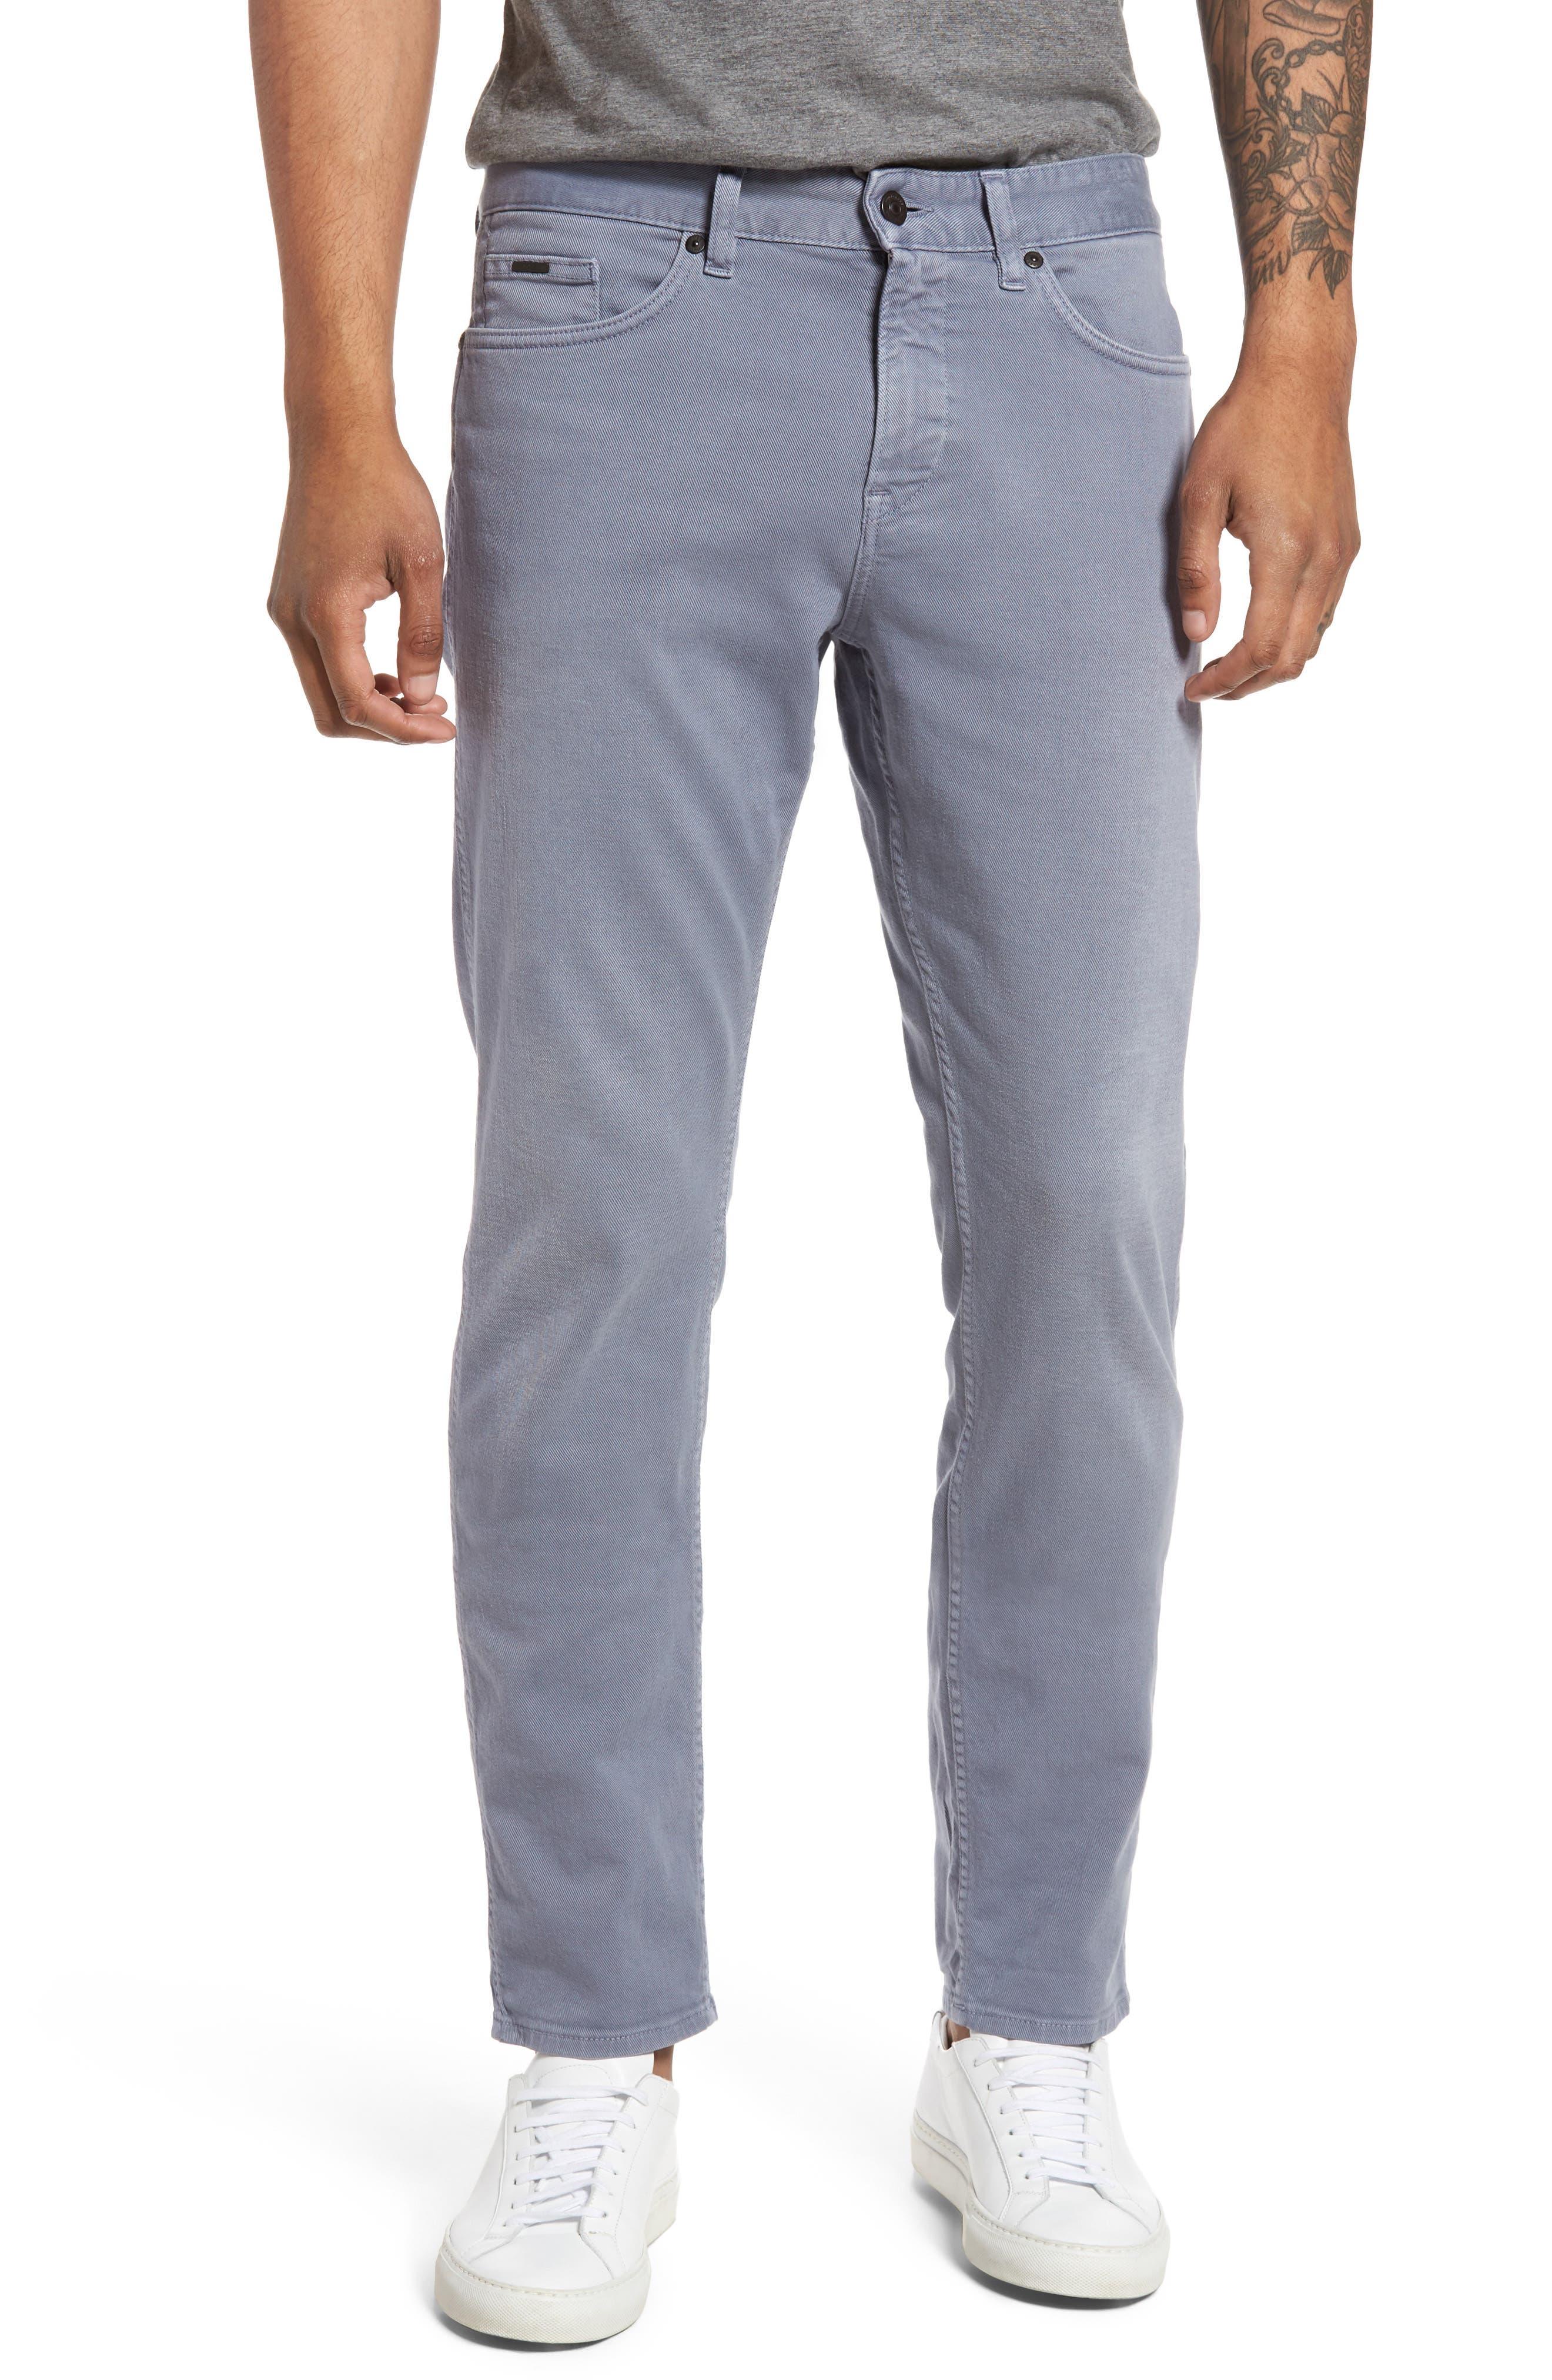 Delaware Slim Fit Jeans,                         Main,                         color, 462